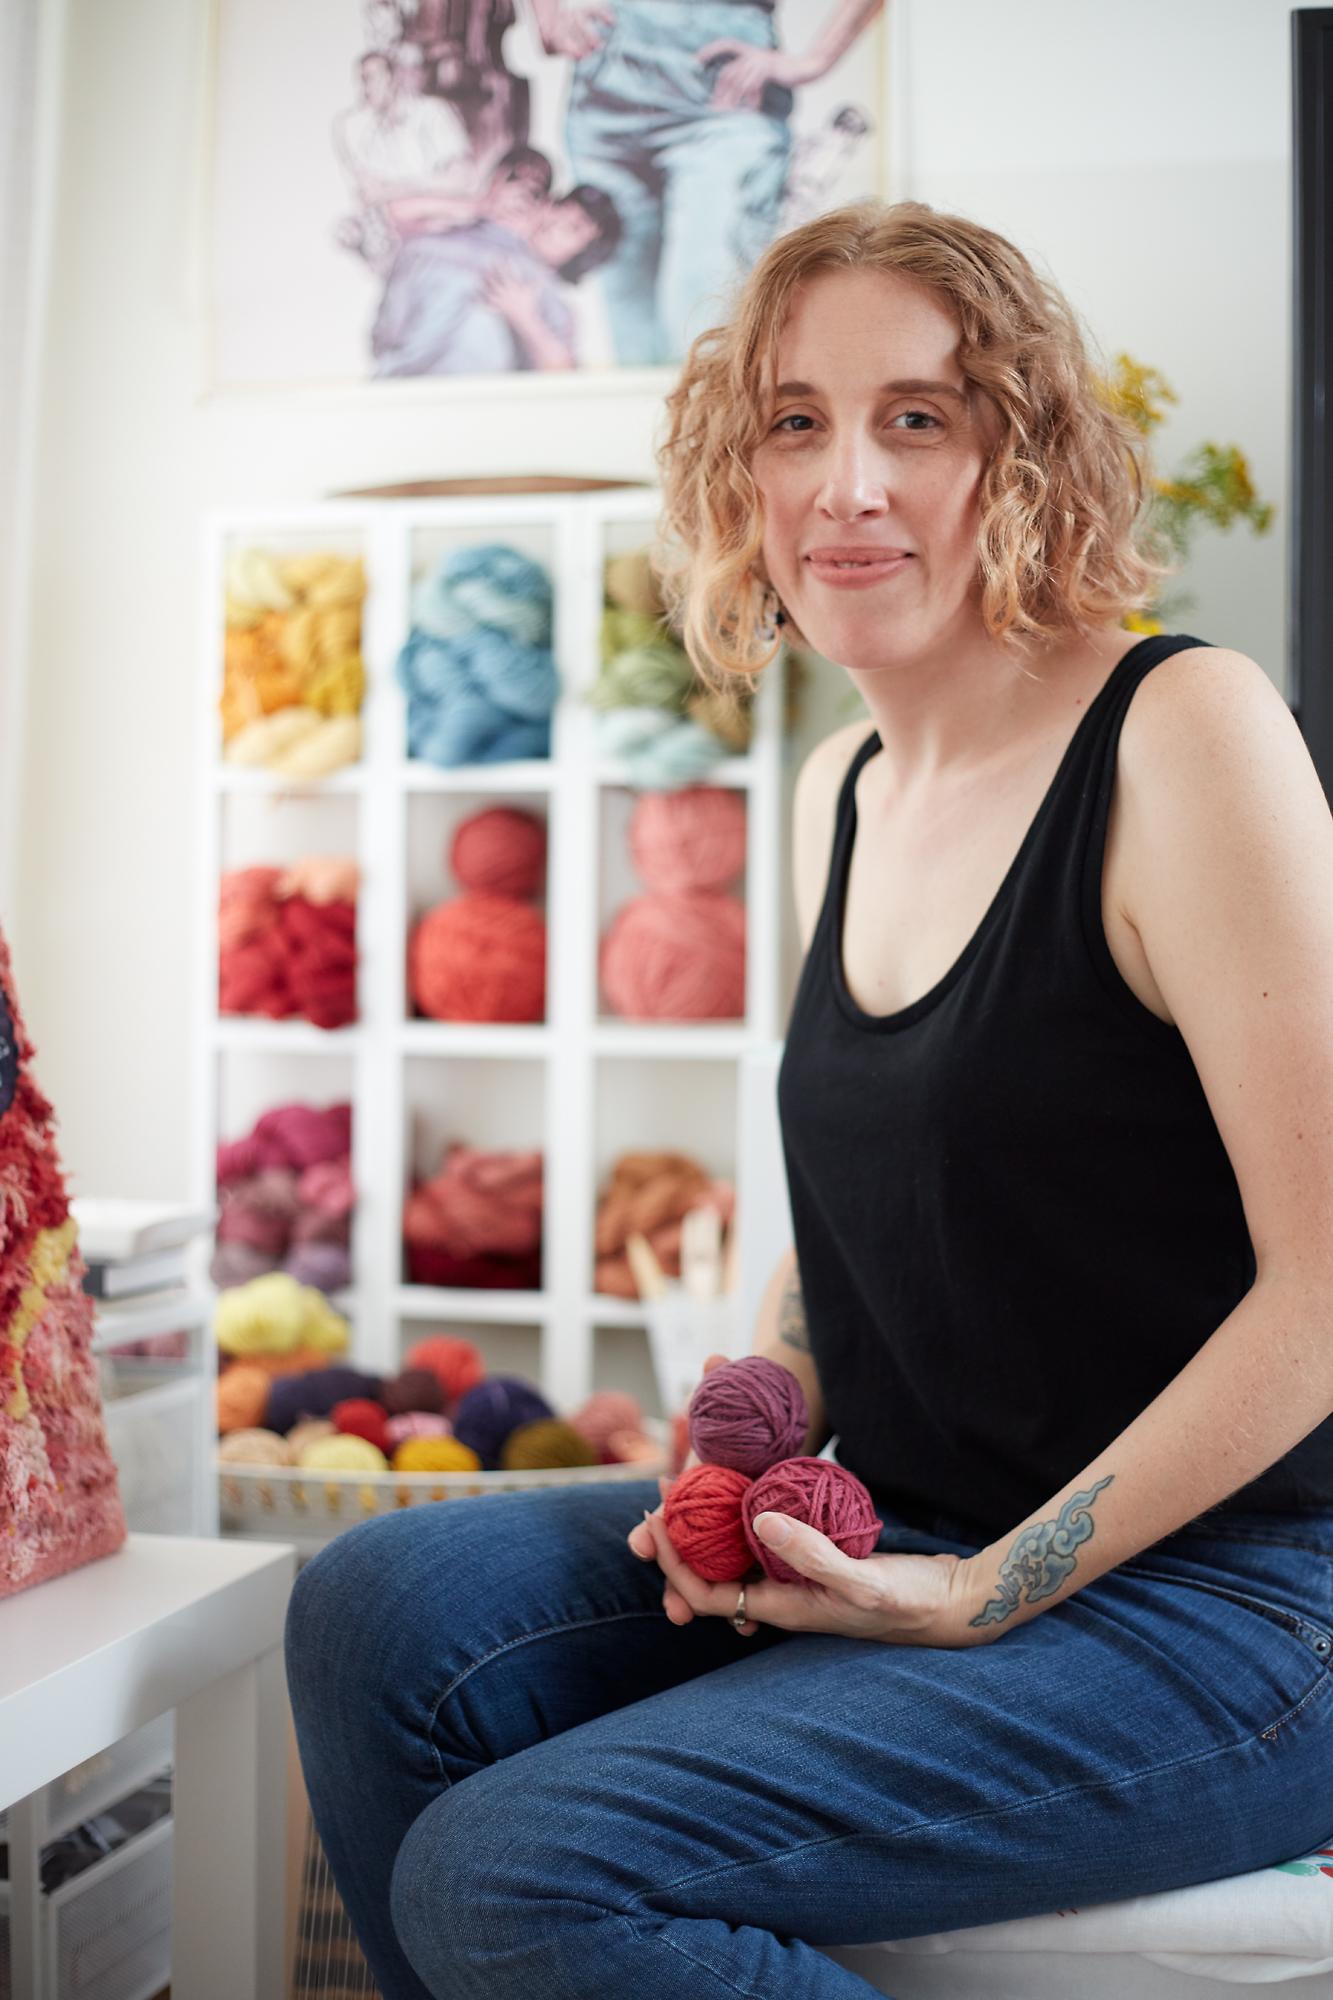 - Serah HedinLångsam Dyed Goods StudioVancouver, BC